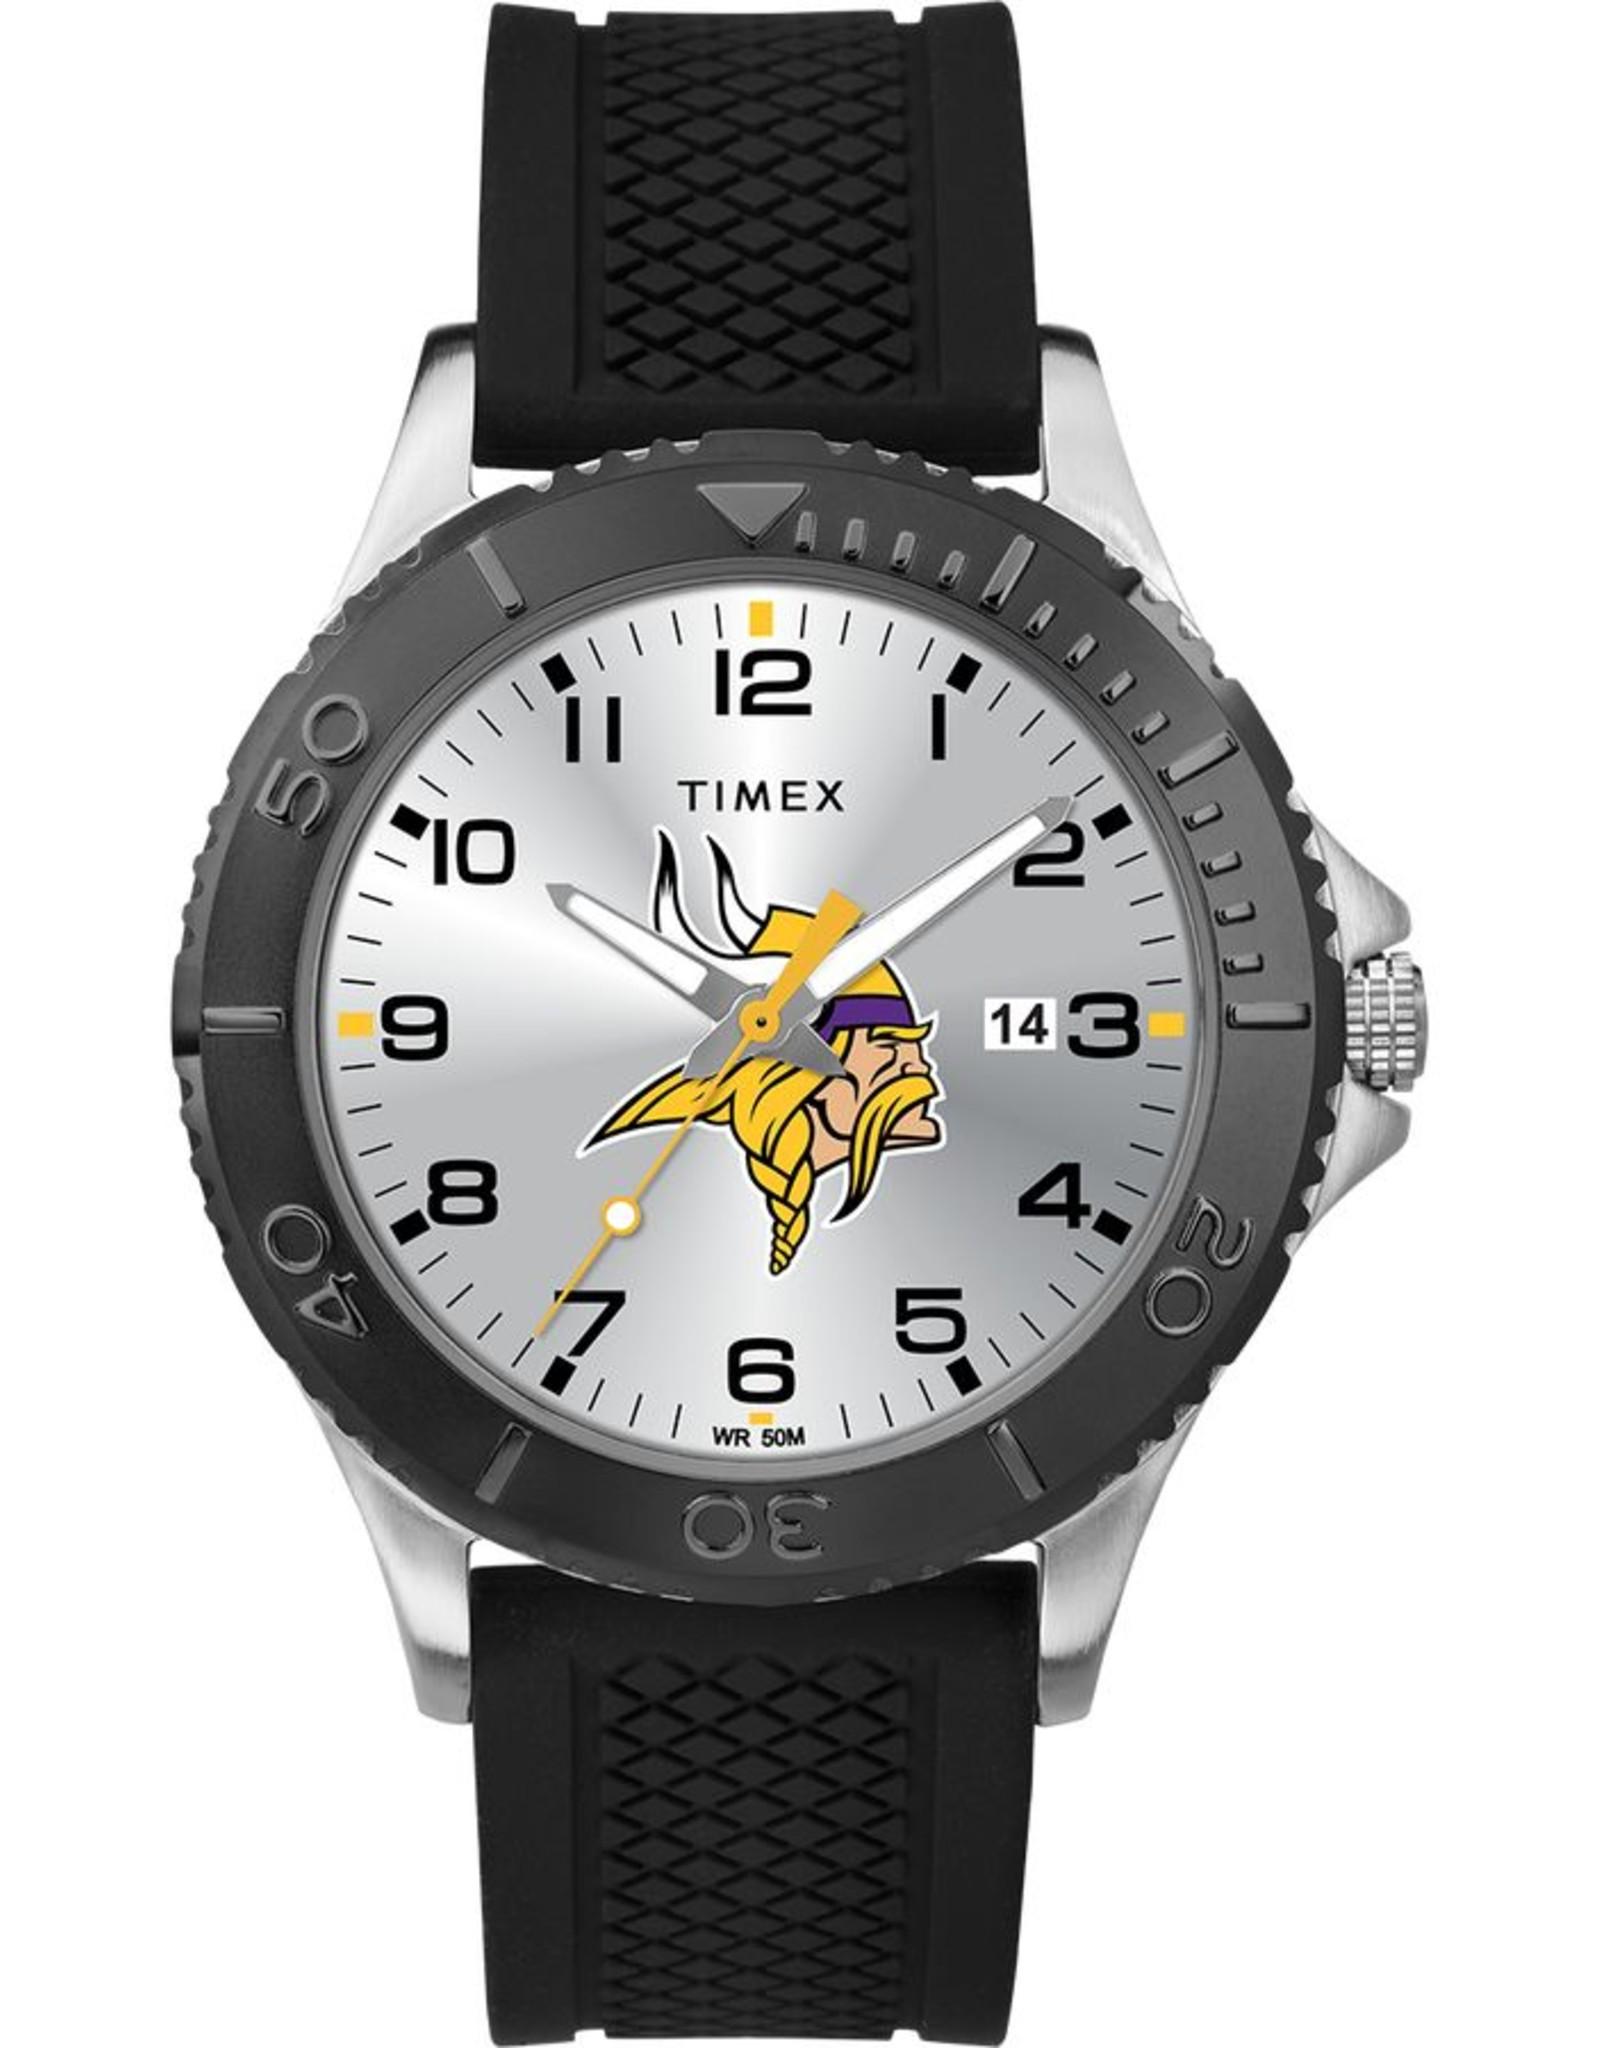 Minnesota Vikings Timex Gamer Watch